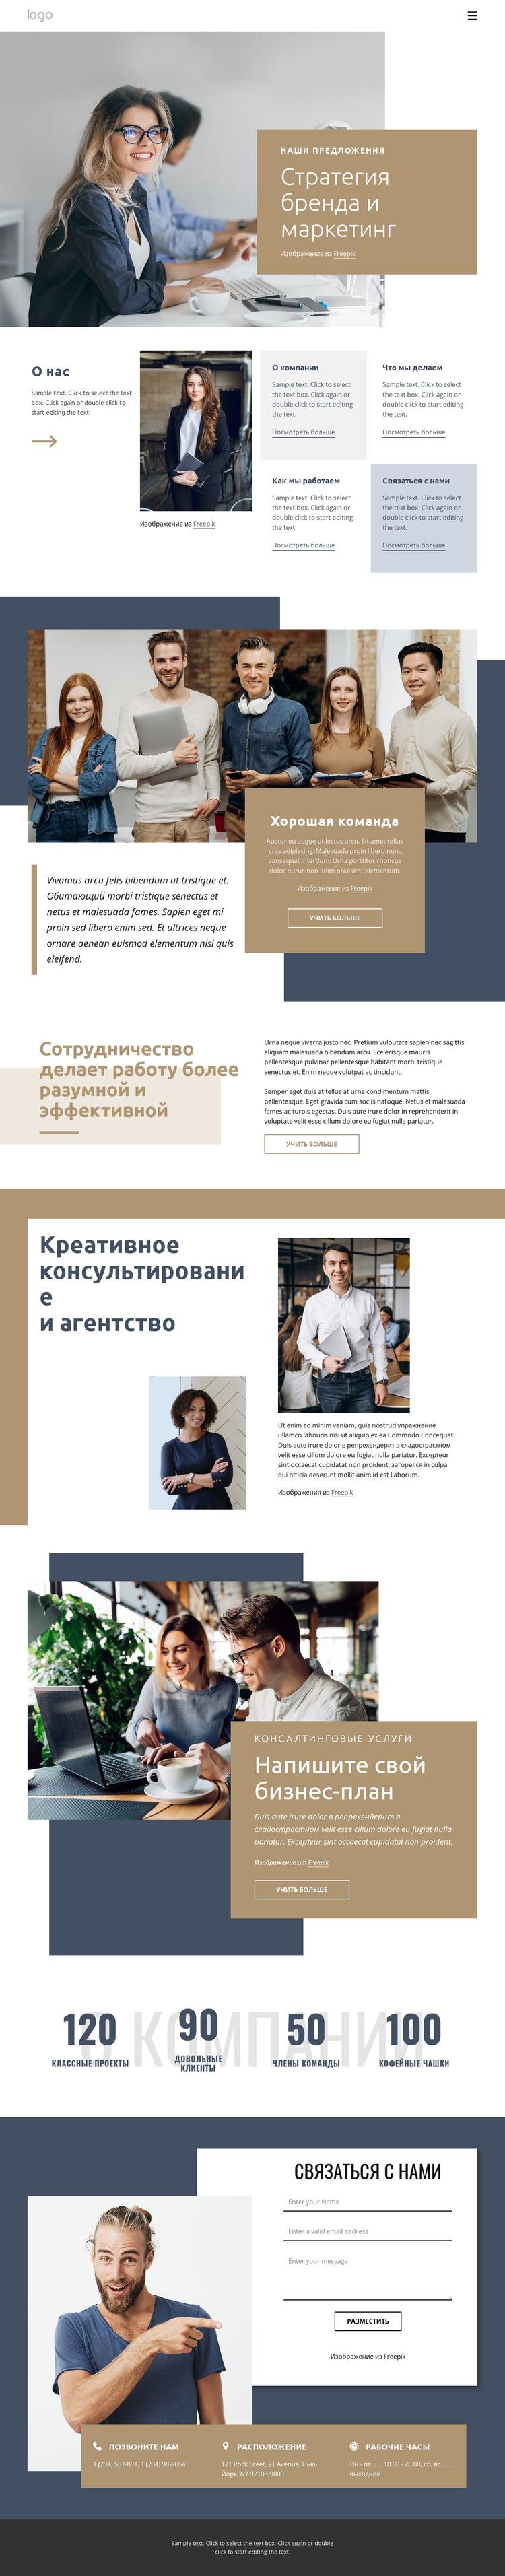 Стратегия бренда и маркетинг Шаблон веб-сайта